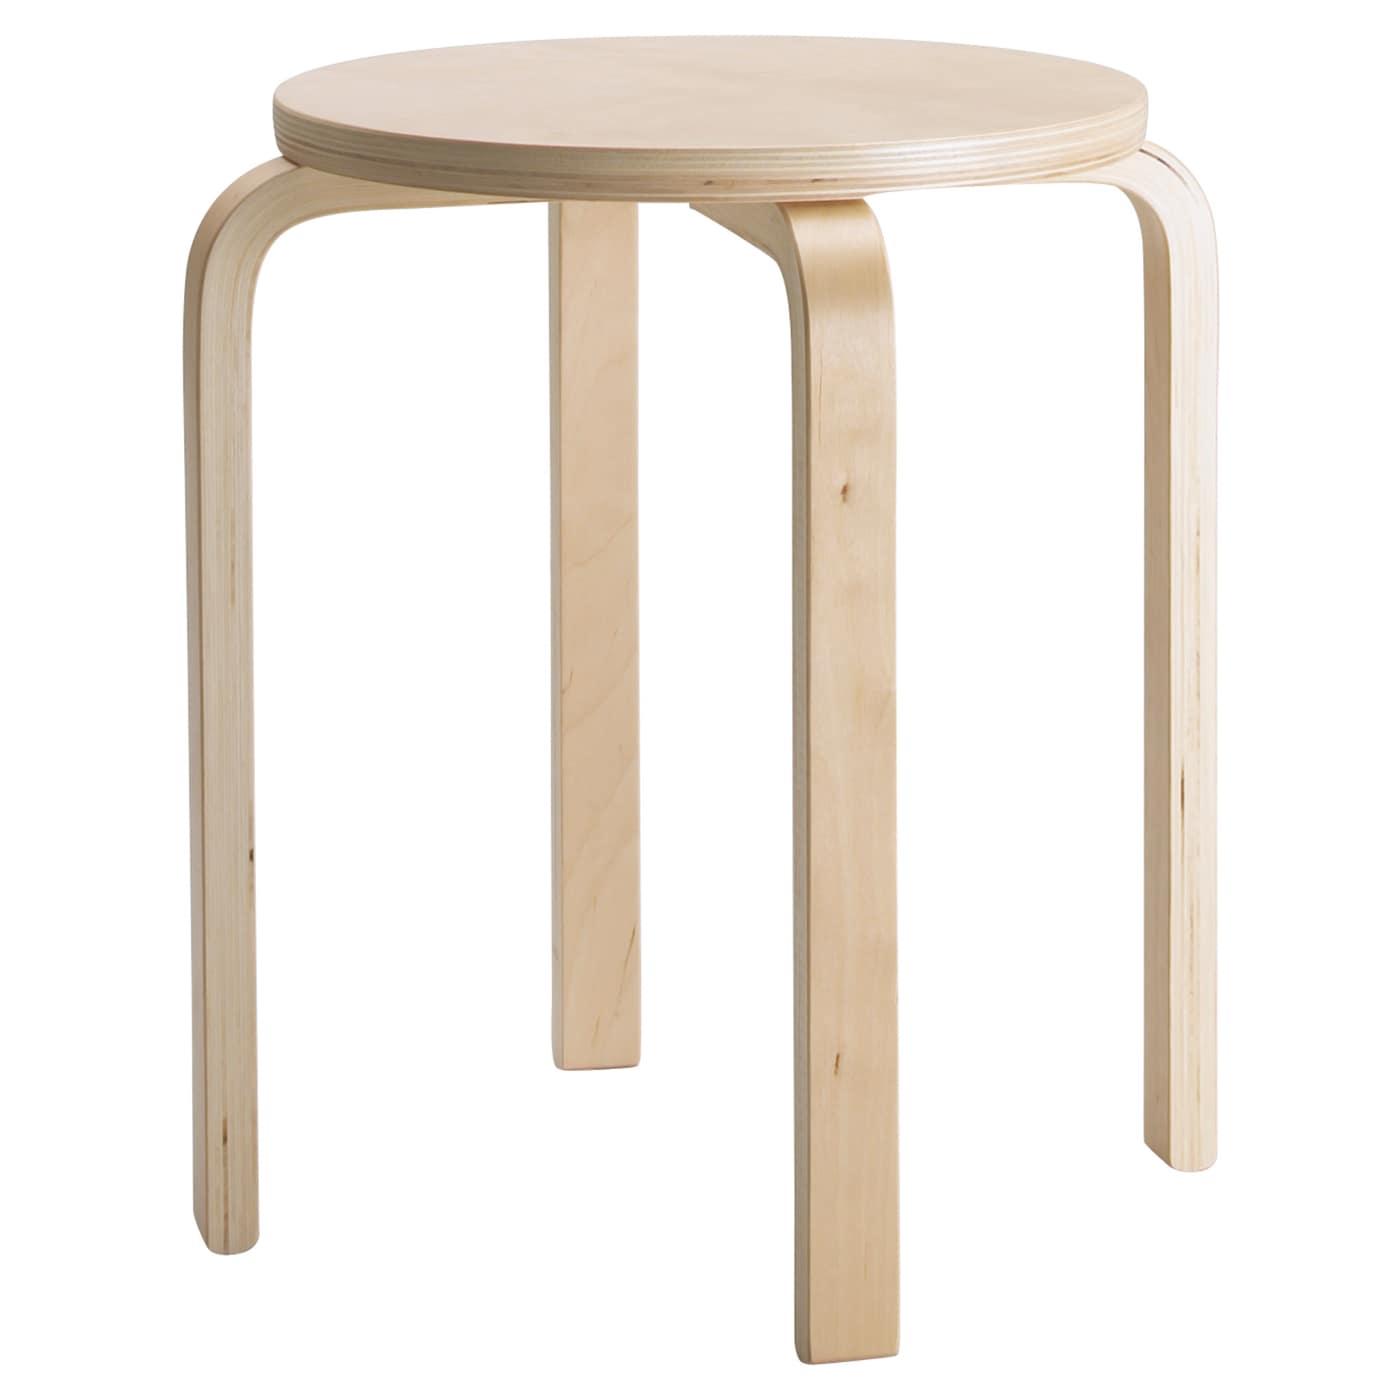 FROSTA stool